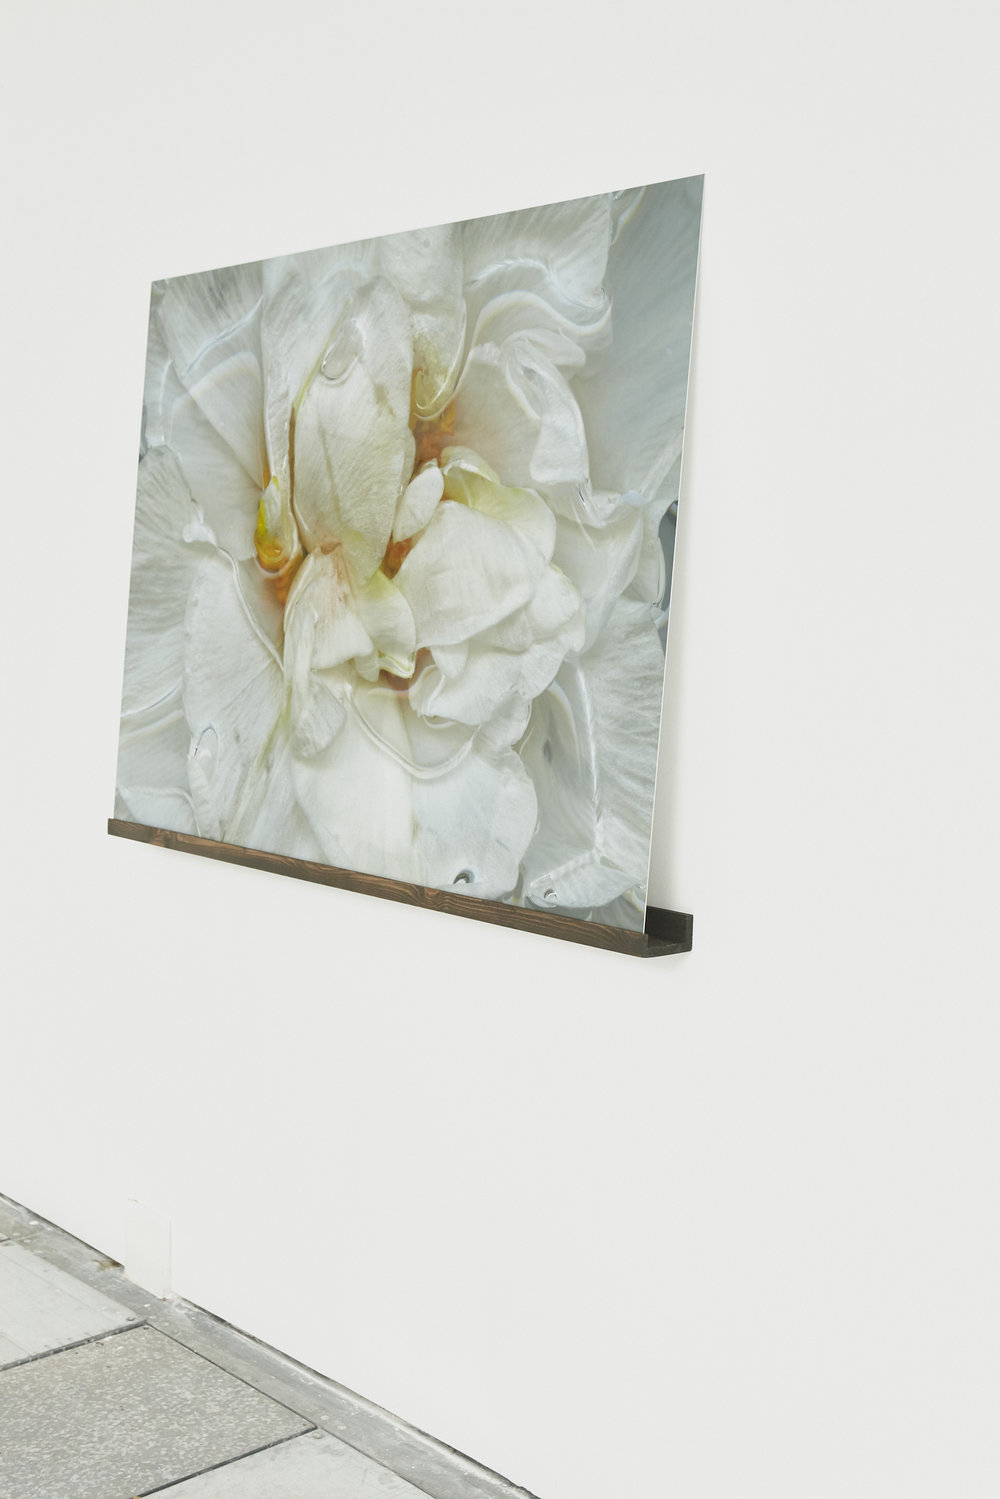 anna-skladmann-2018_2_20_openspace_gallery_grace_exhibtion__MG_0130+1.jpg